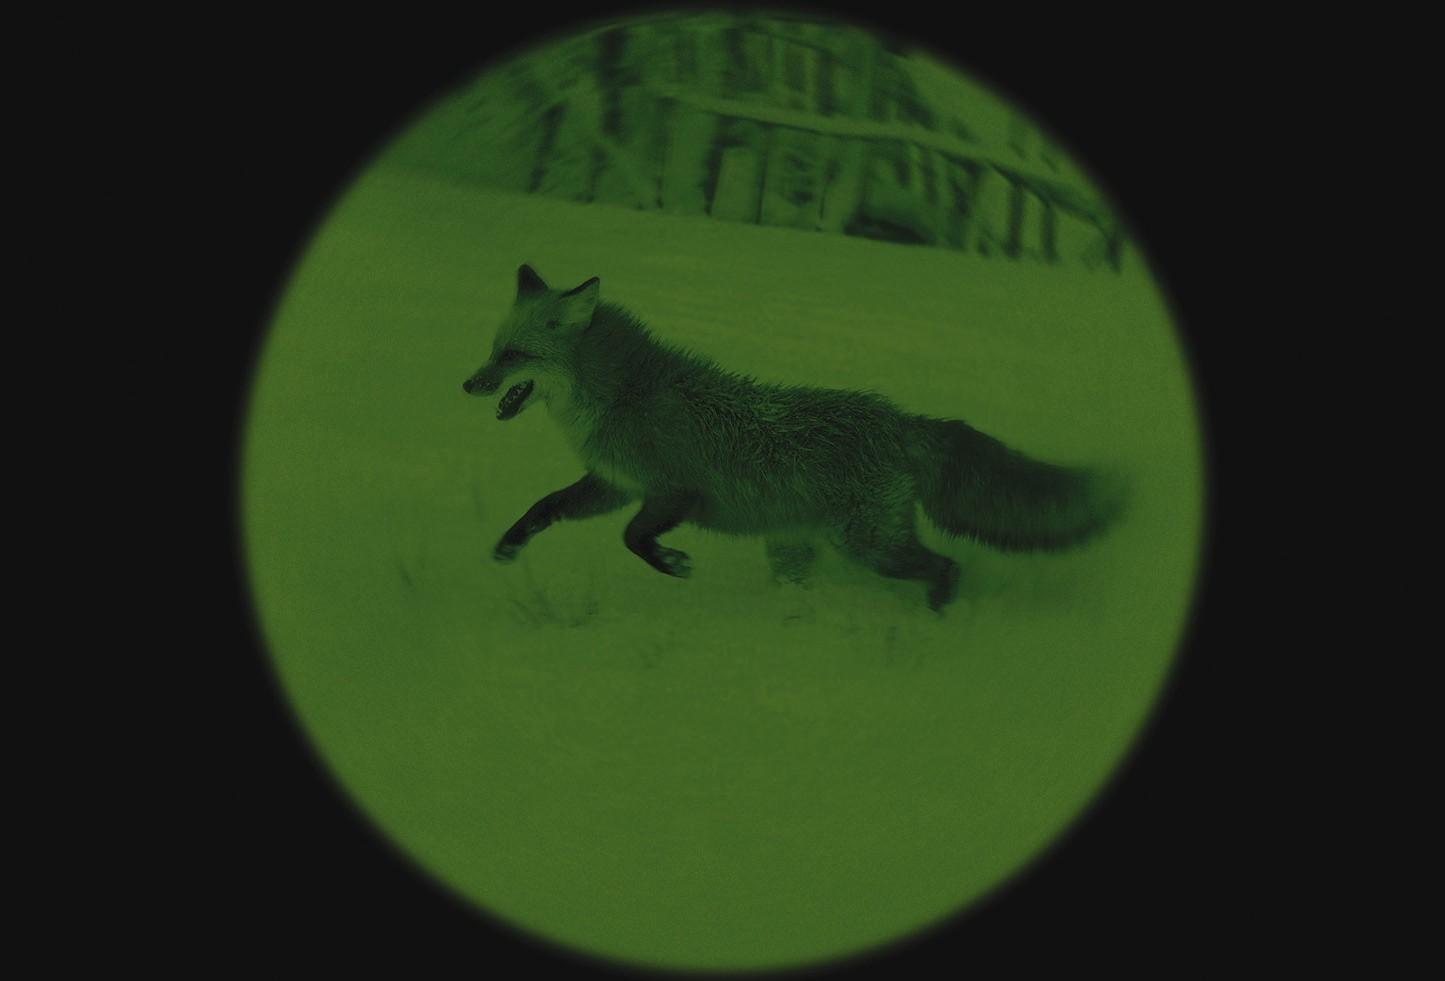 monoculaire vision nocturne yukon patrol 4x50 jumelles vision nocturne made in chasse. Black Bedroom Furniture Sets. Home Design Ideas